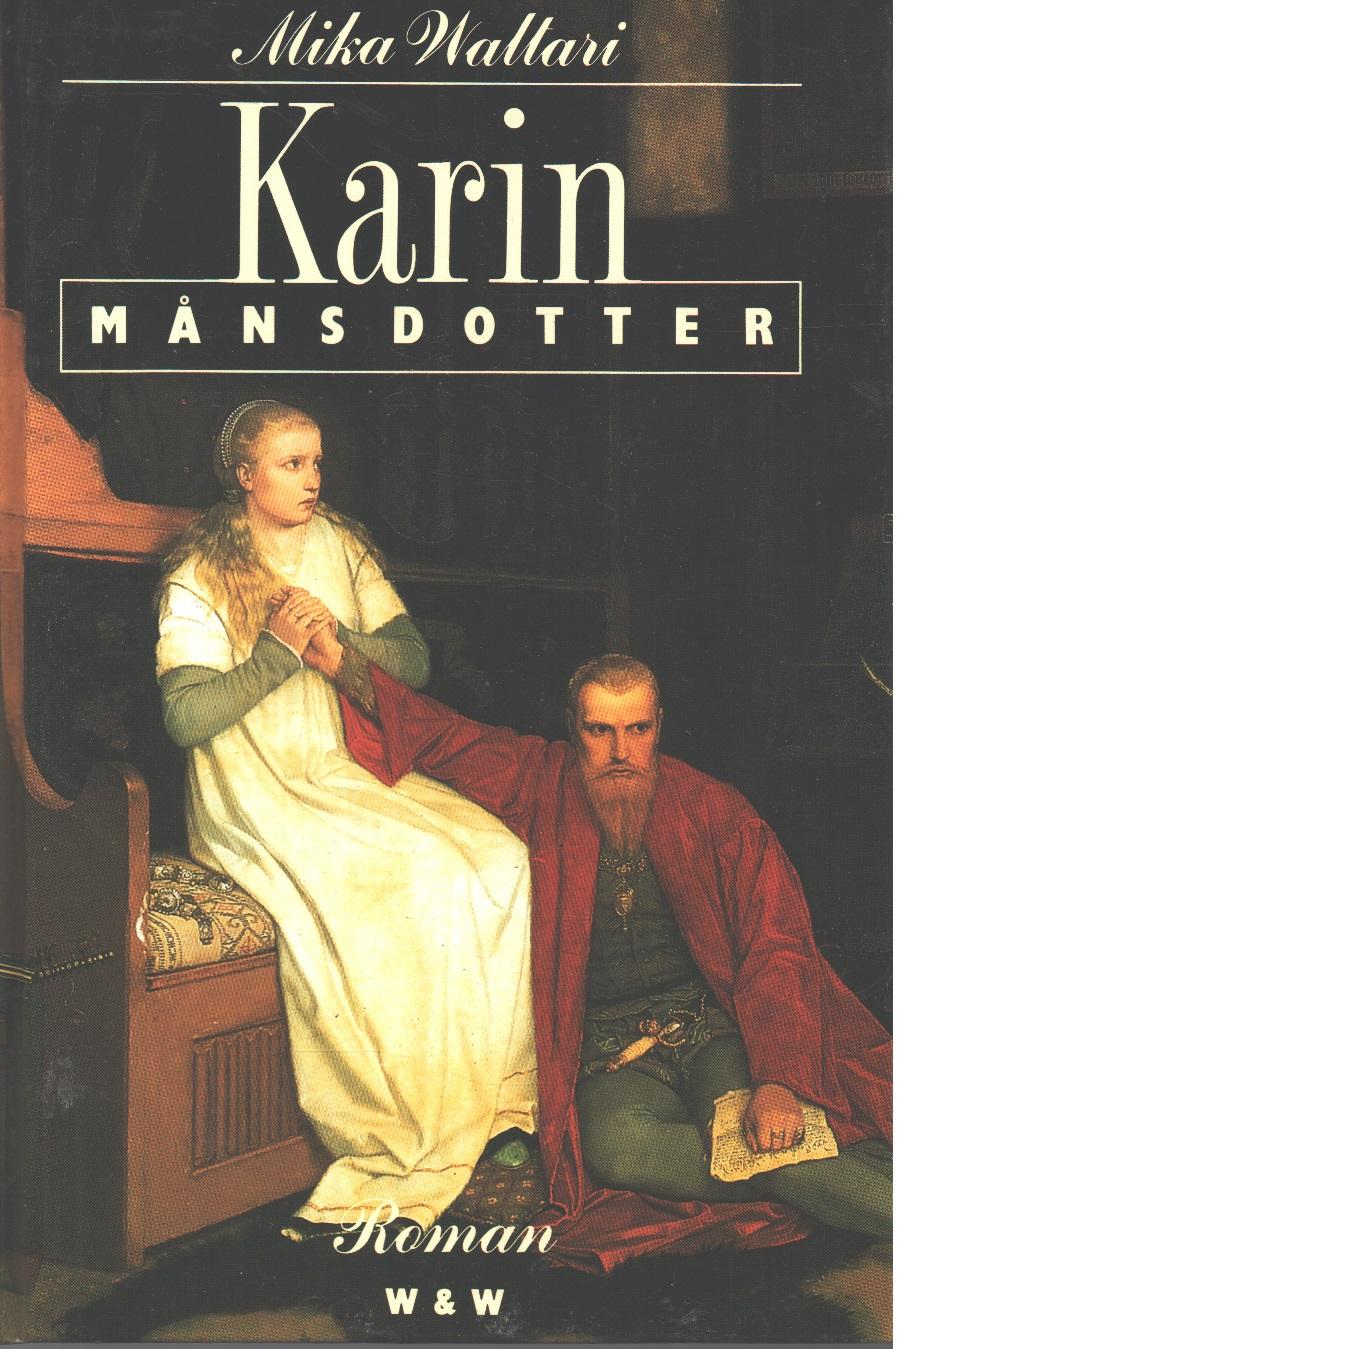 Karin Månsdotter - Waltari, Mika